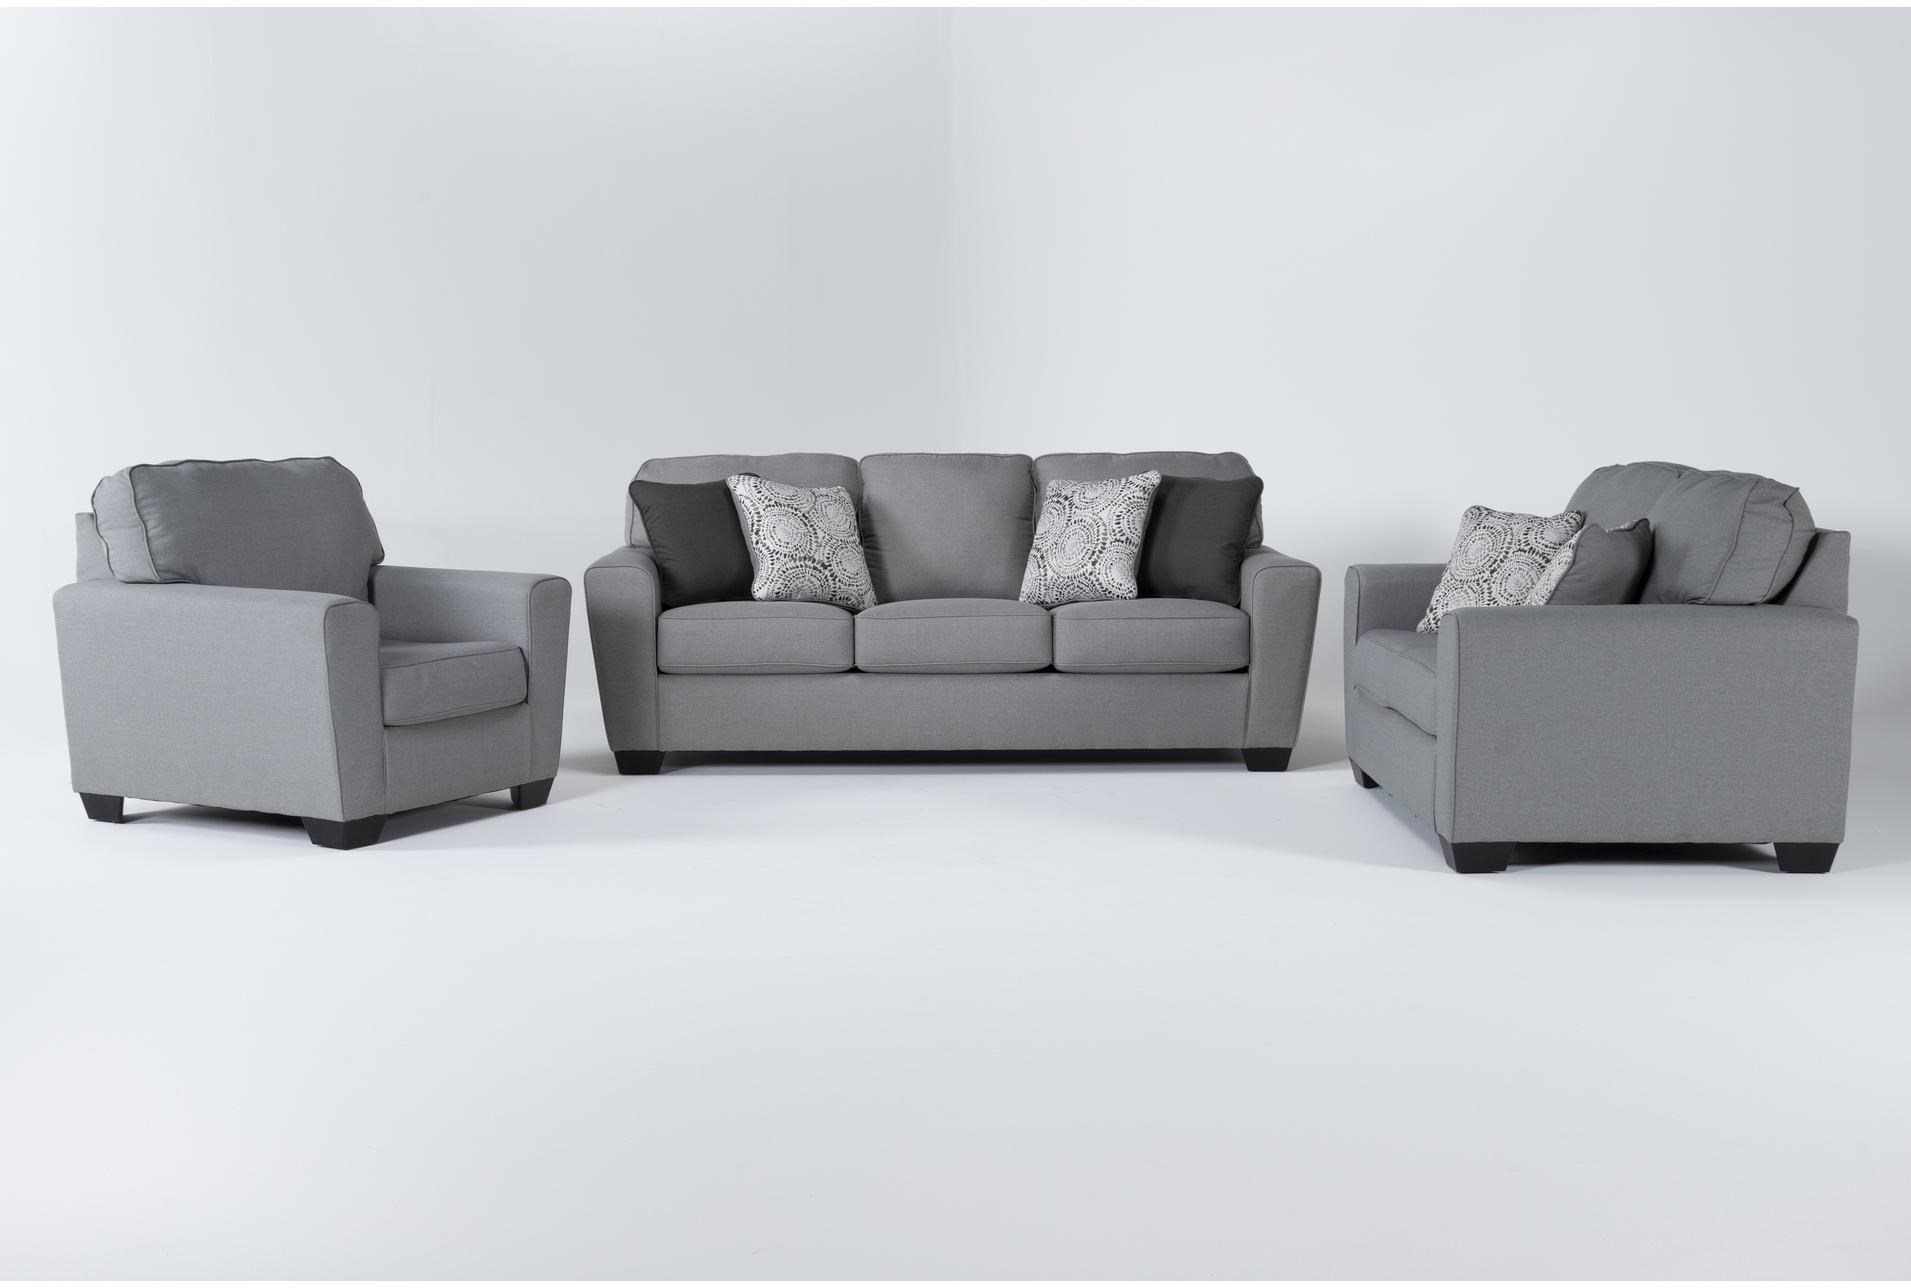 Mcdade Ash 3 Piece Living Room Set, Comfort Living Furniture San Leandro